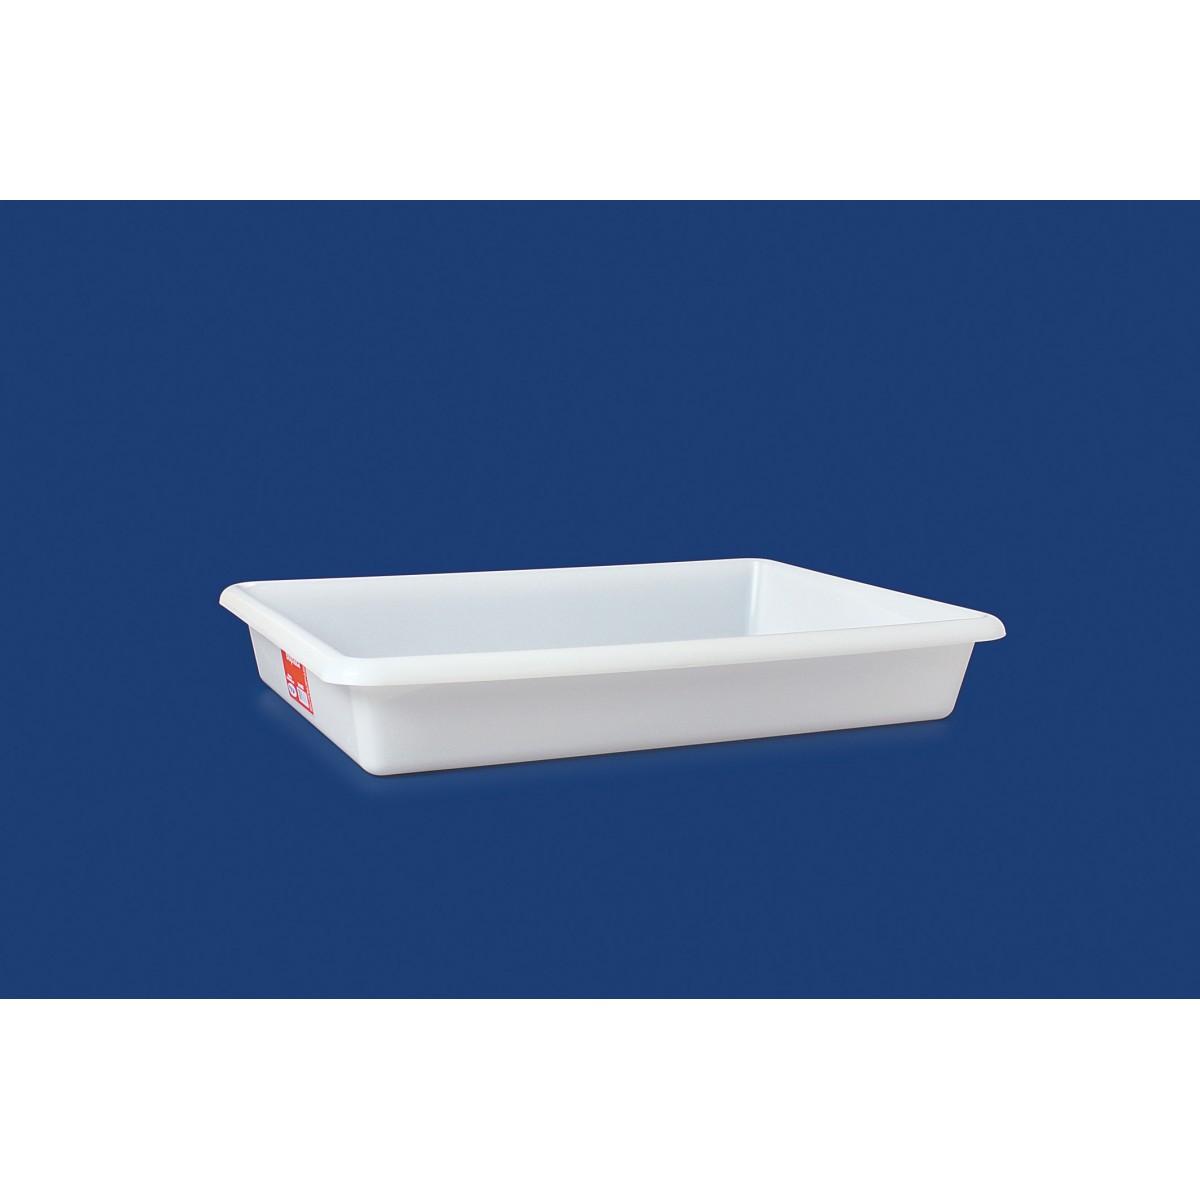 Caixa Plástica Bioprátika 0757  - Loja Embalatudo